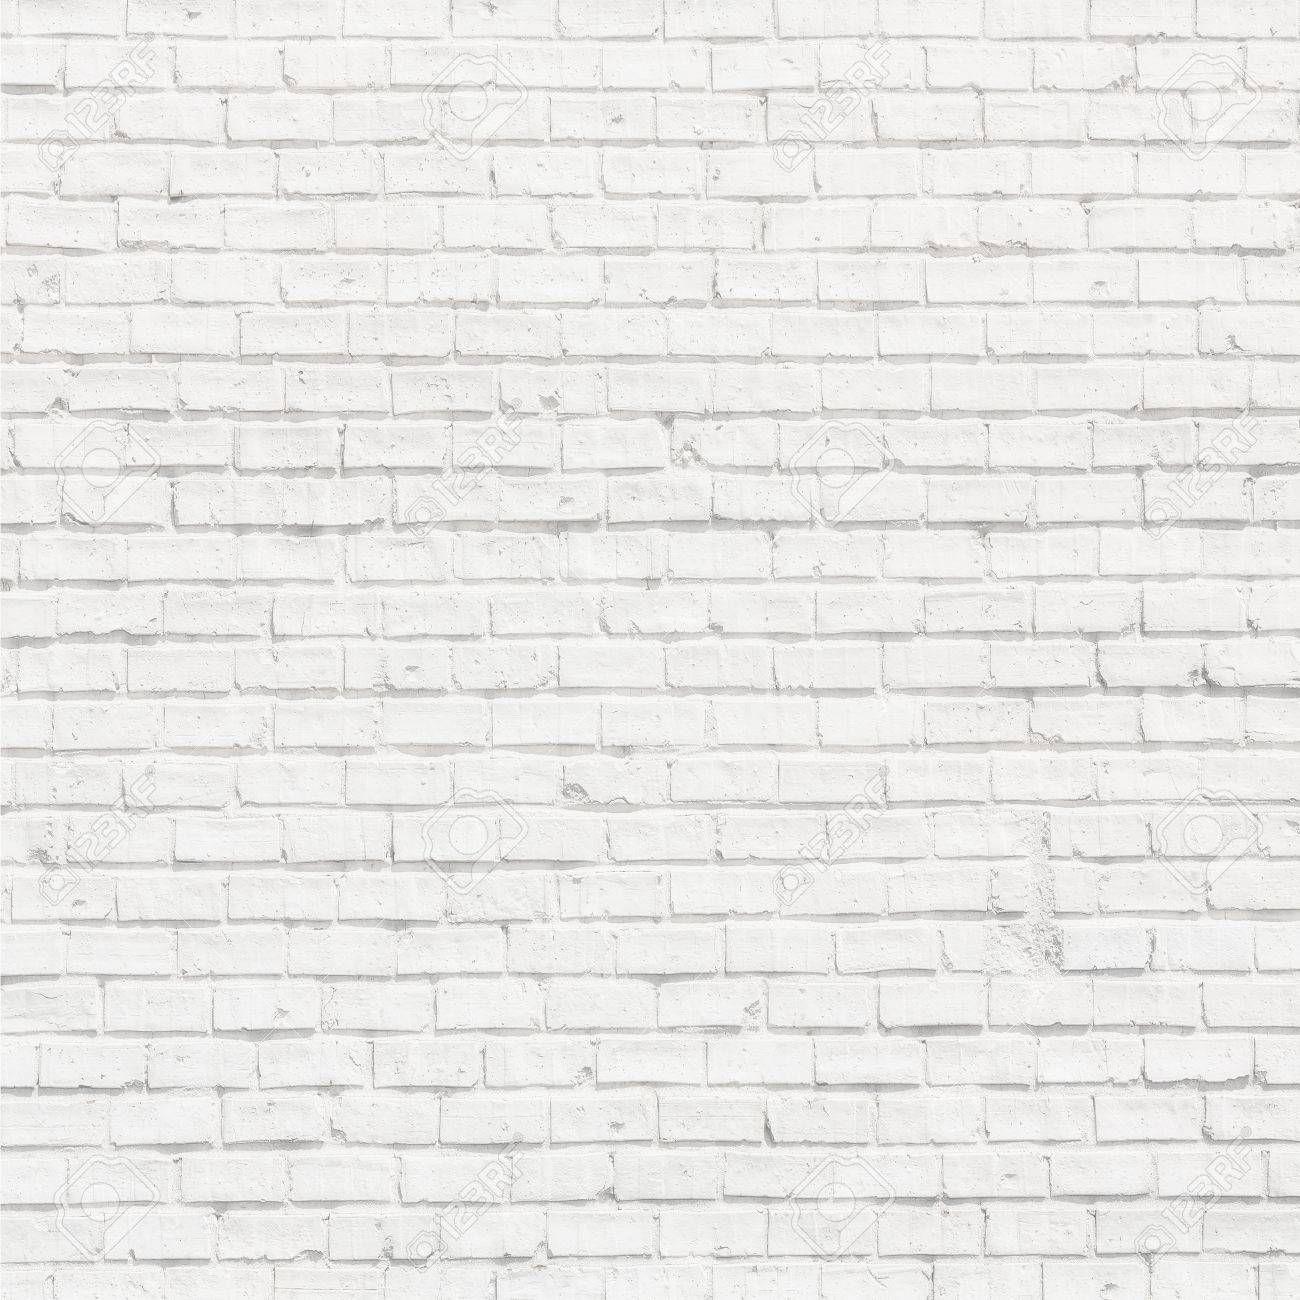 White Brick Wall For Background Or Texture побеленный кирпич белые кирпичные стены кирпичная стена